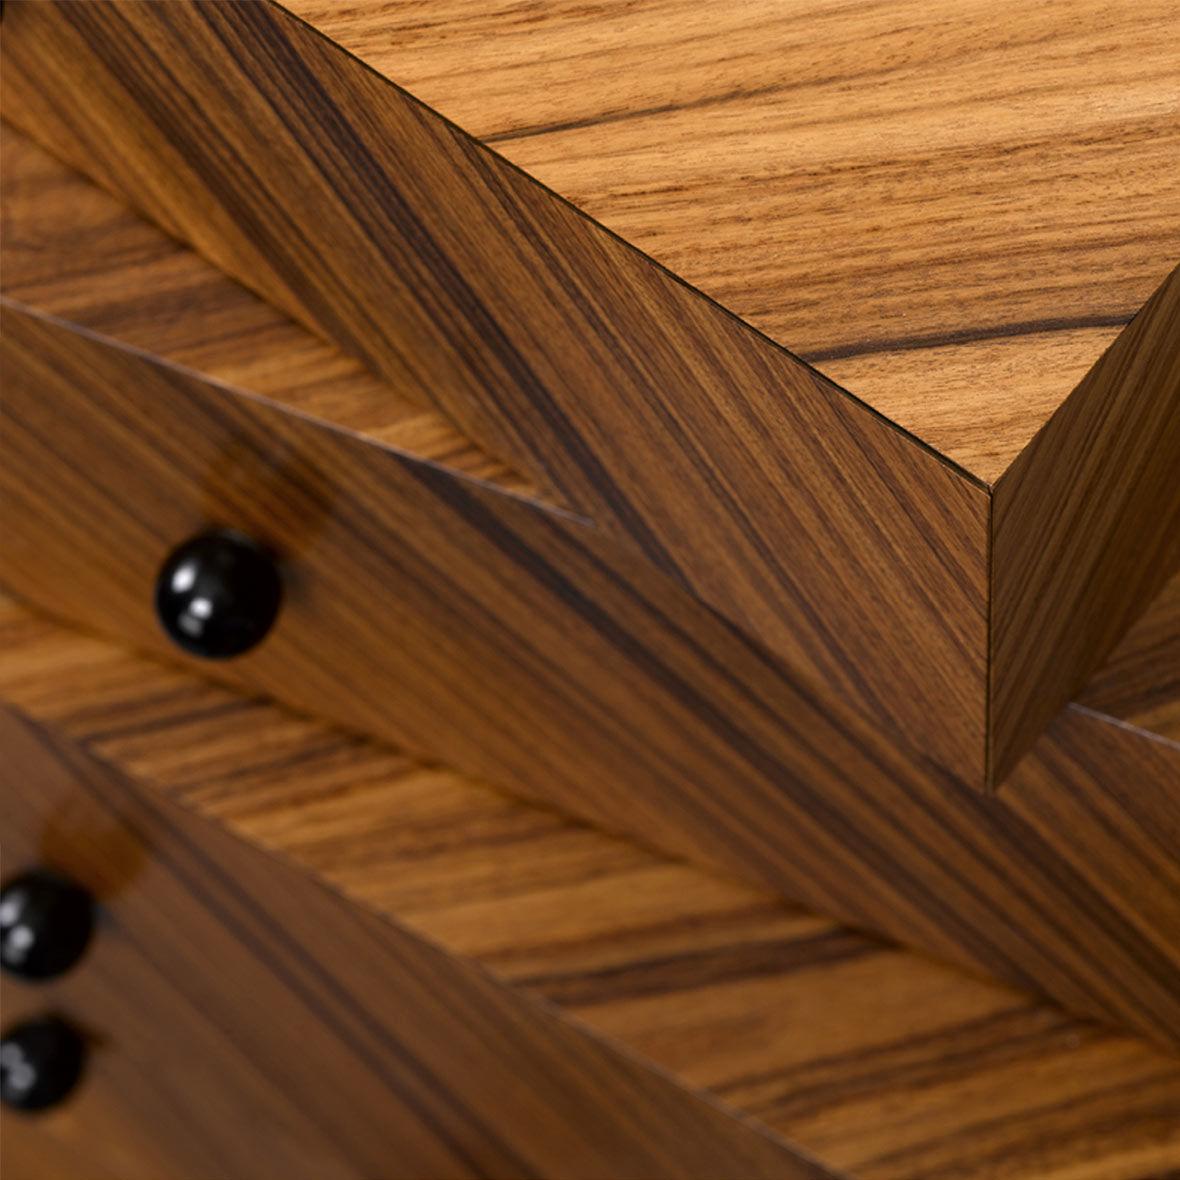 Berner Design Preis 2017 Schuhbladenstapel